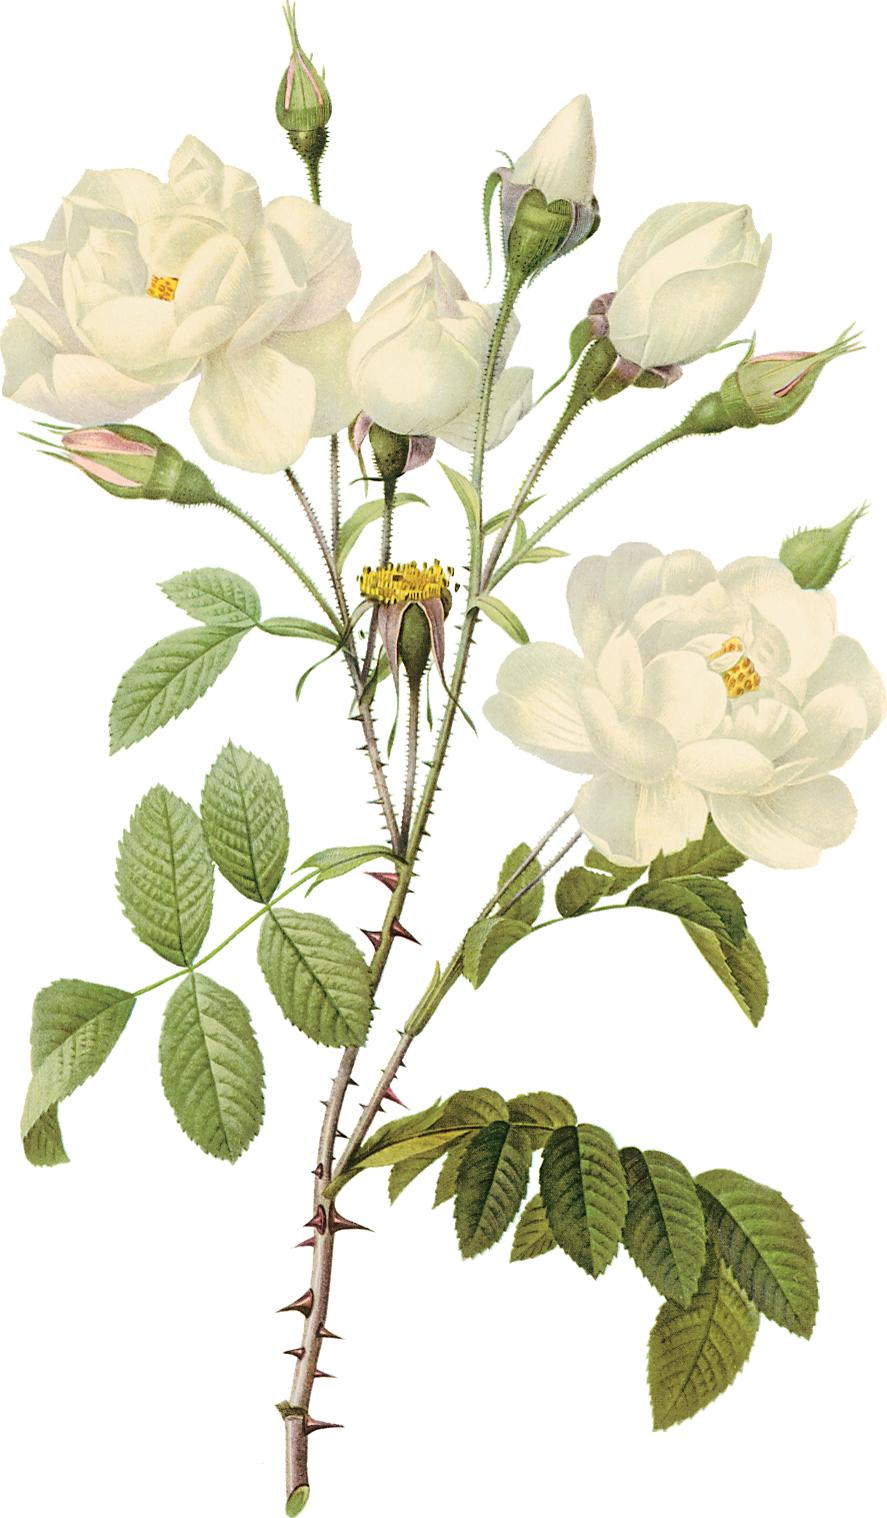 Rose petals png free stock photos download (2,789 Free ...